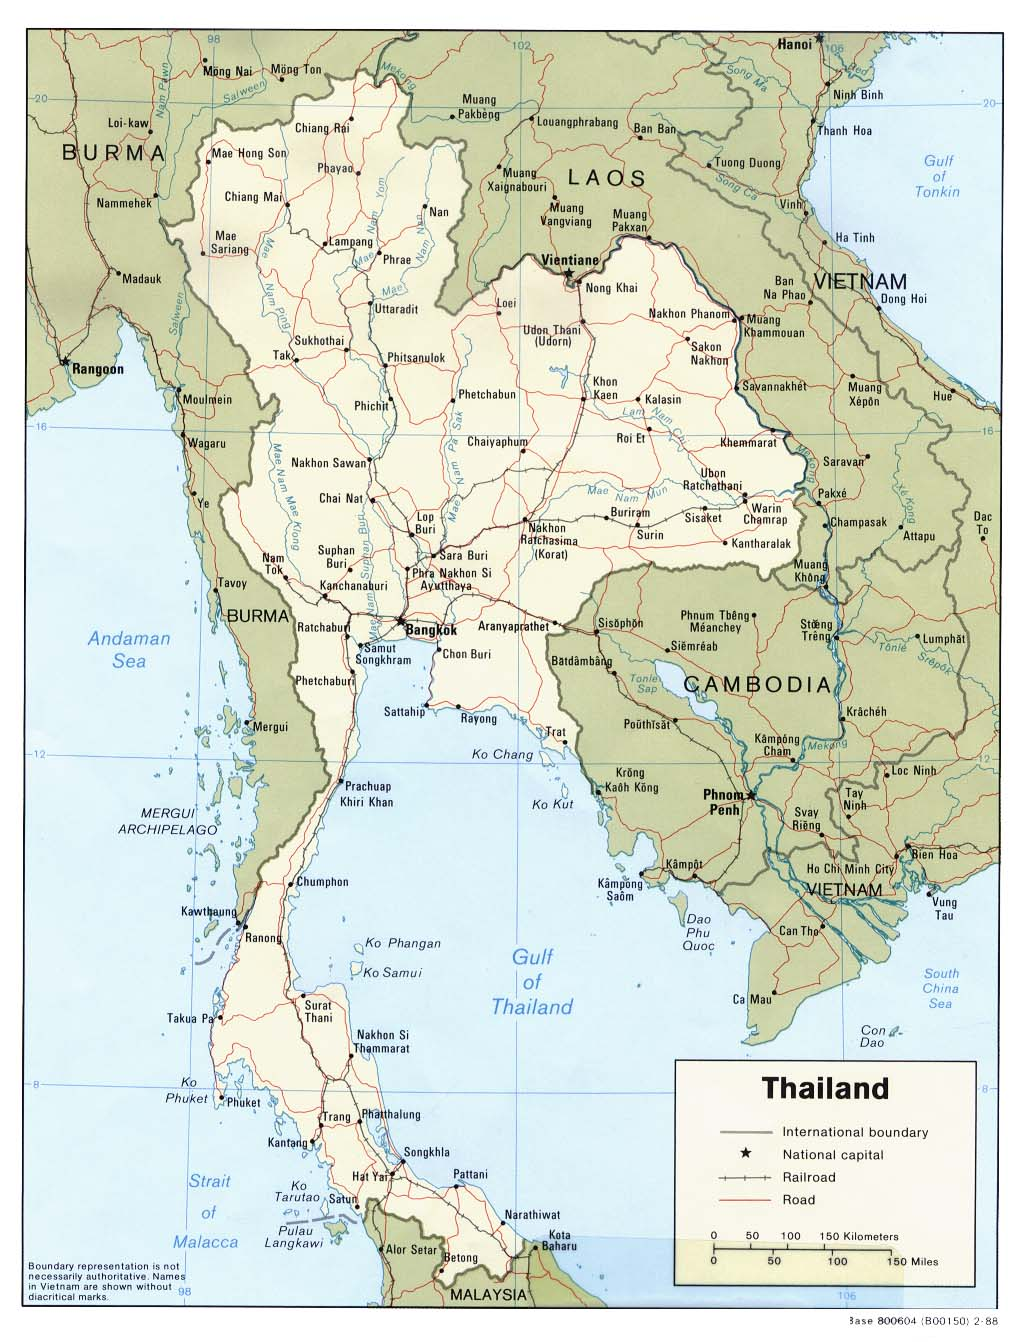 Ŝ�图 Ƴ�国地图 Thailand ĺ�洲地图 Asia Maps Ǿ�景旅游网